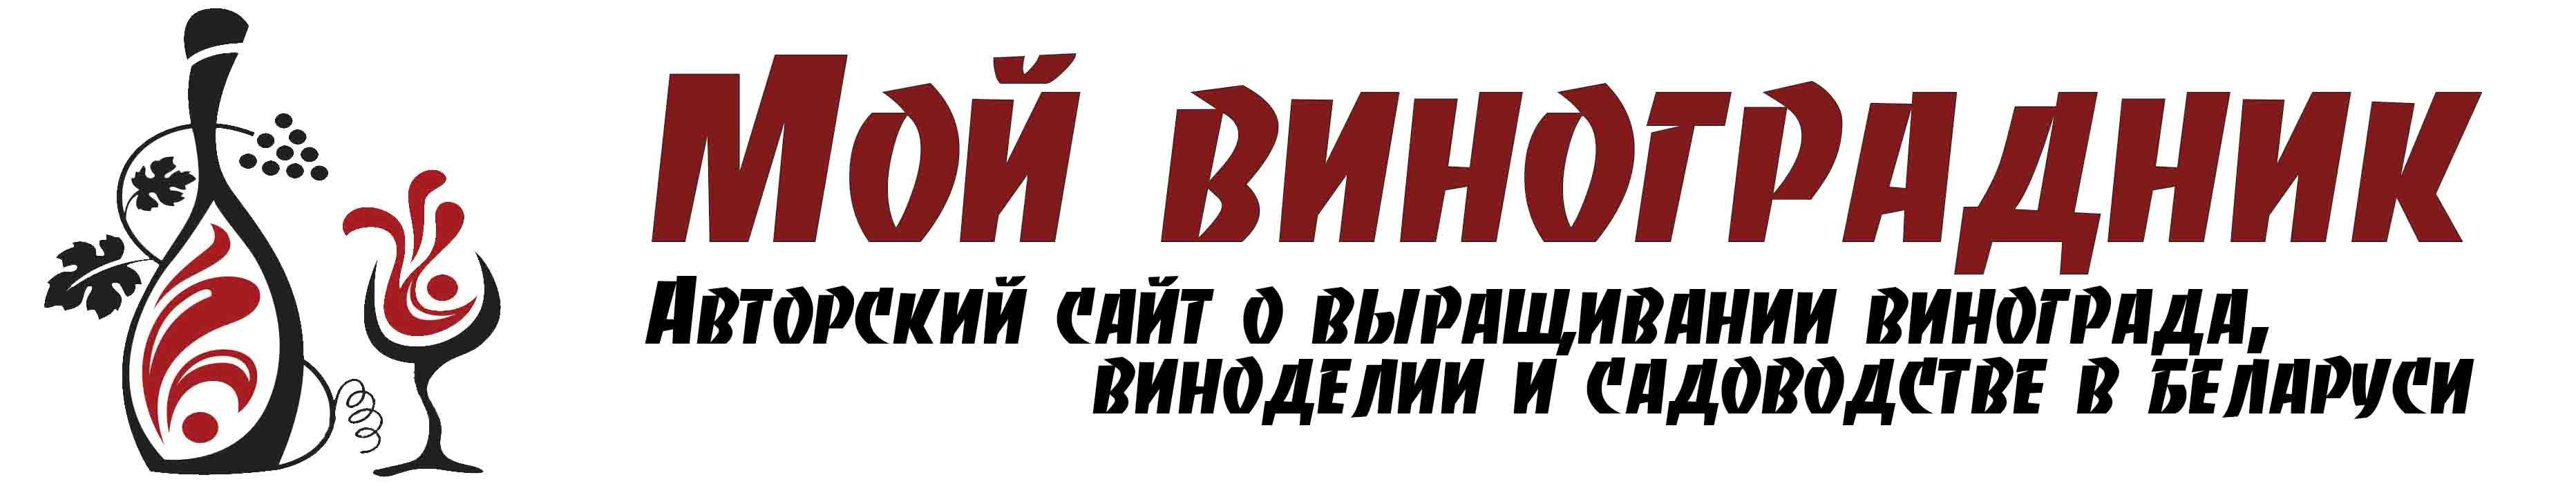 ВИНОГРАДНИК.by